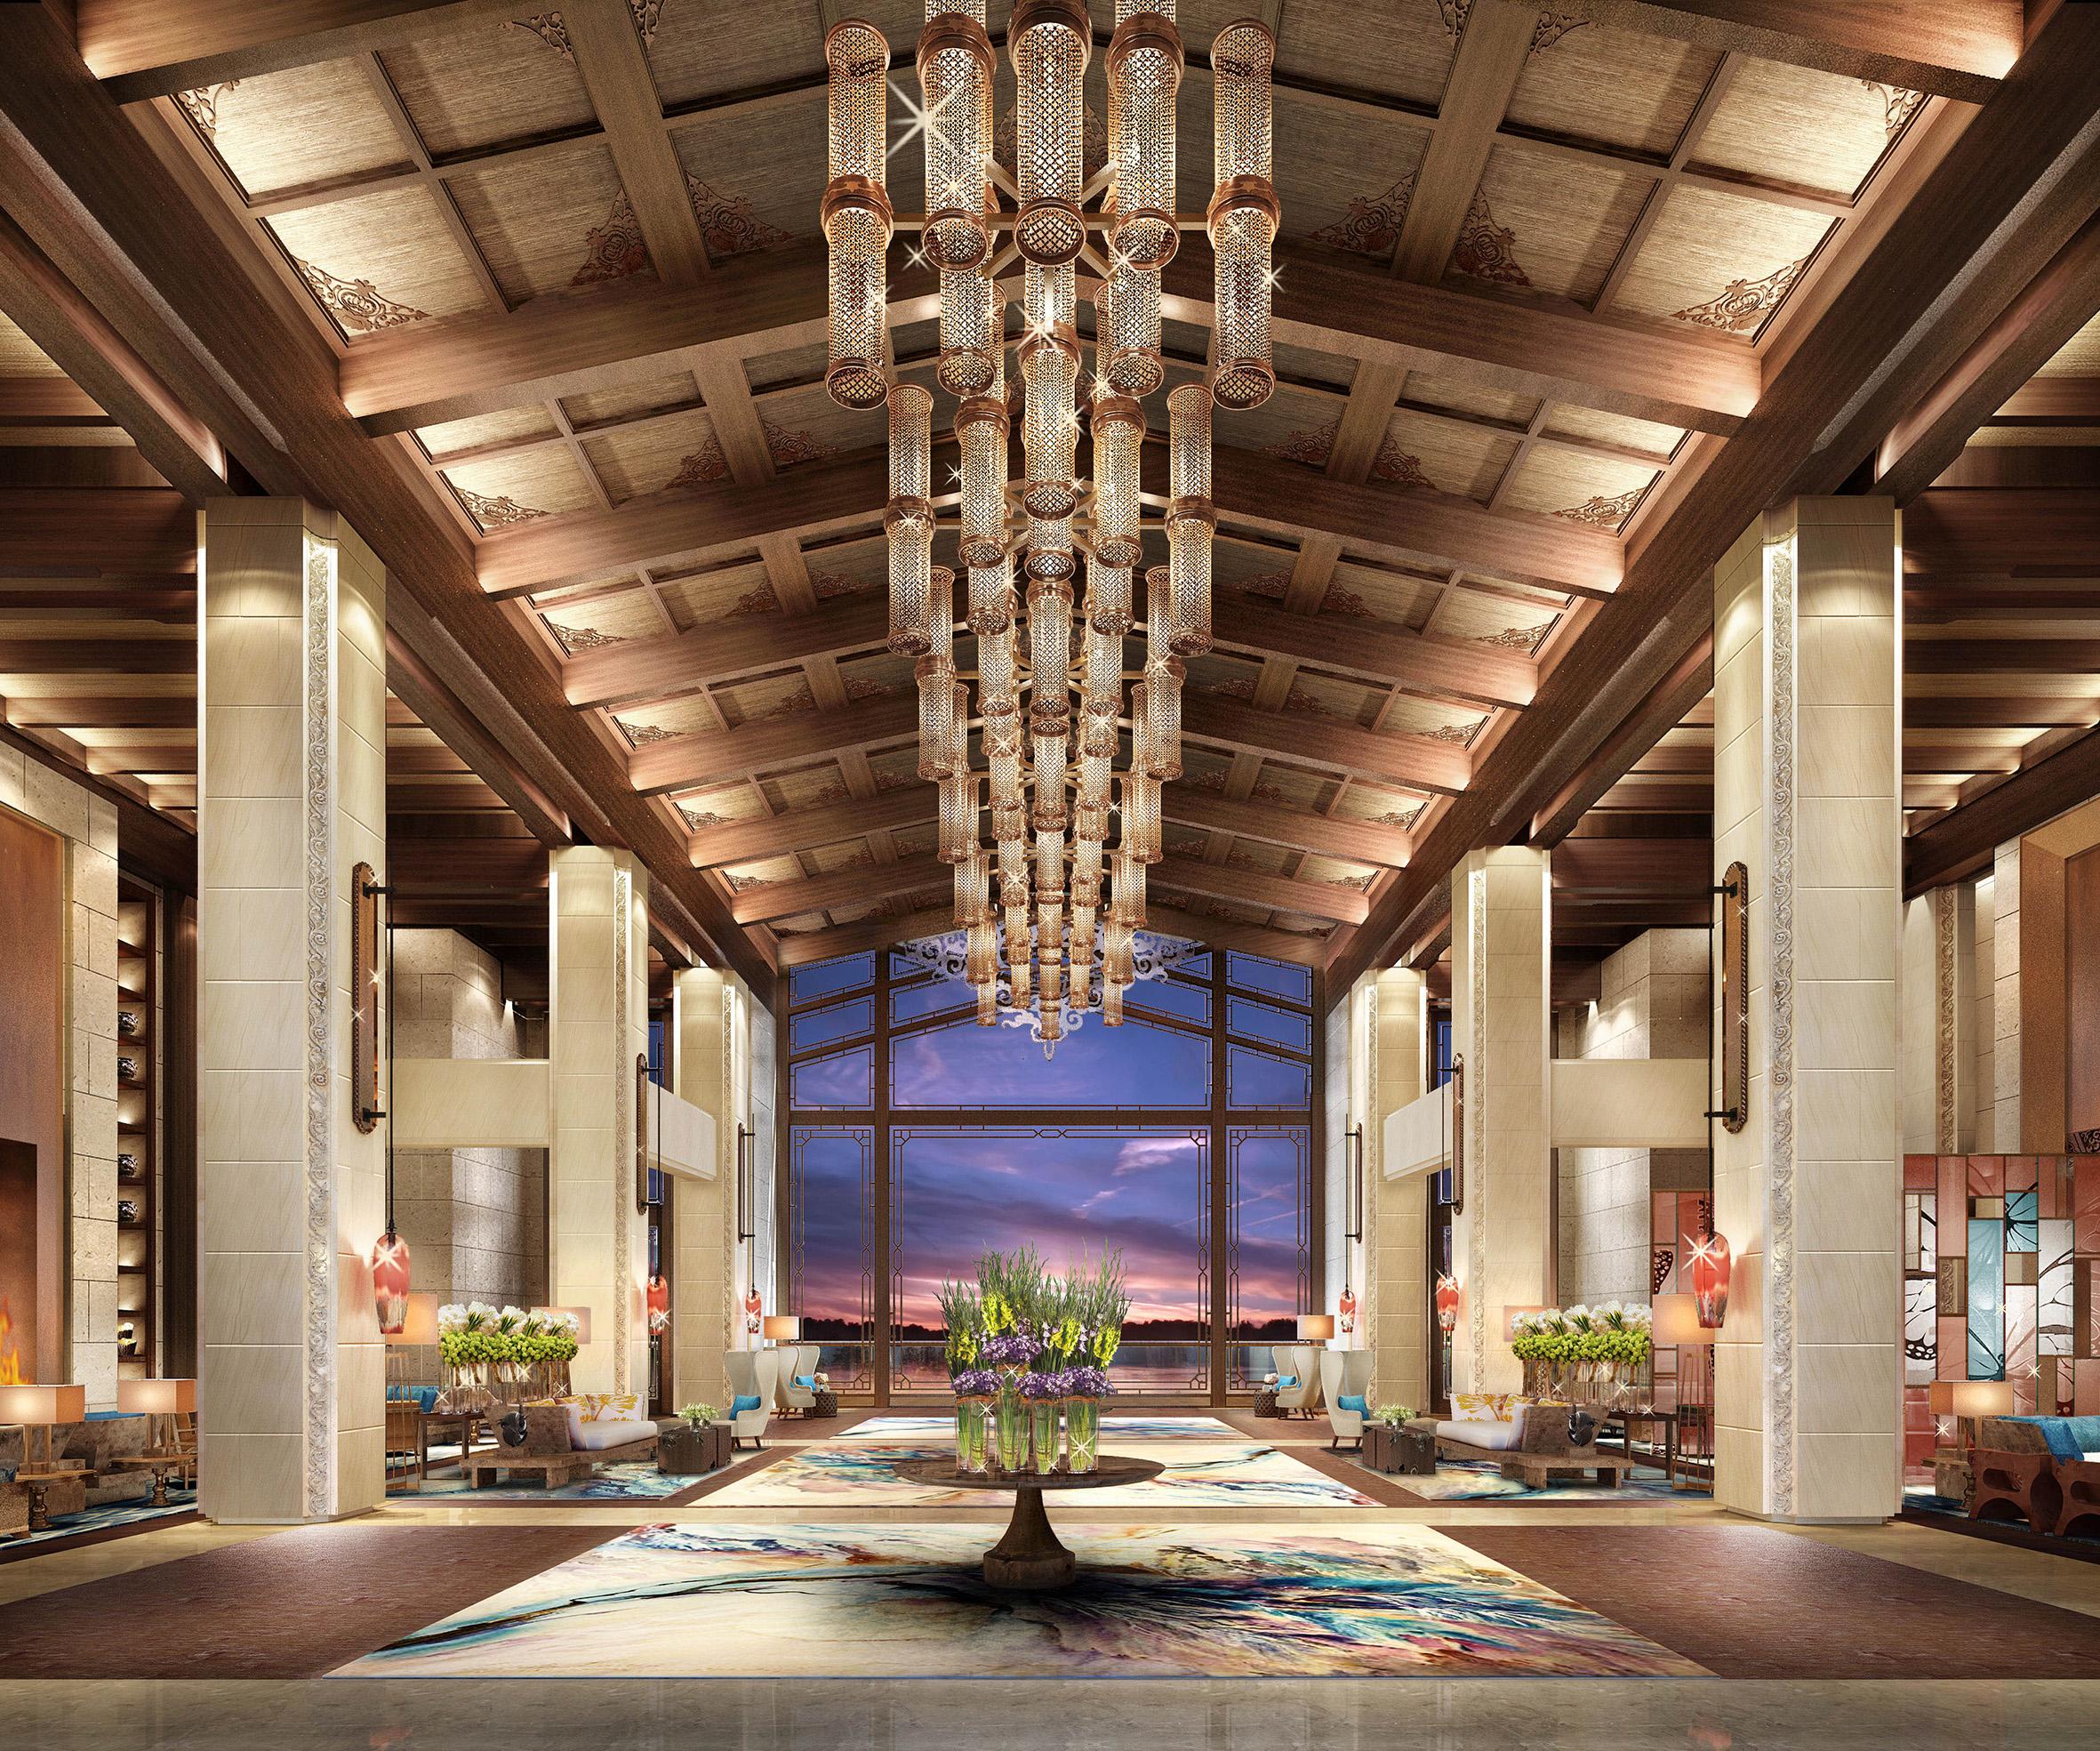 Hilton Hotels Company: Hilton Worldwide Opens Its First Hotel In Dali, Yunnan